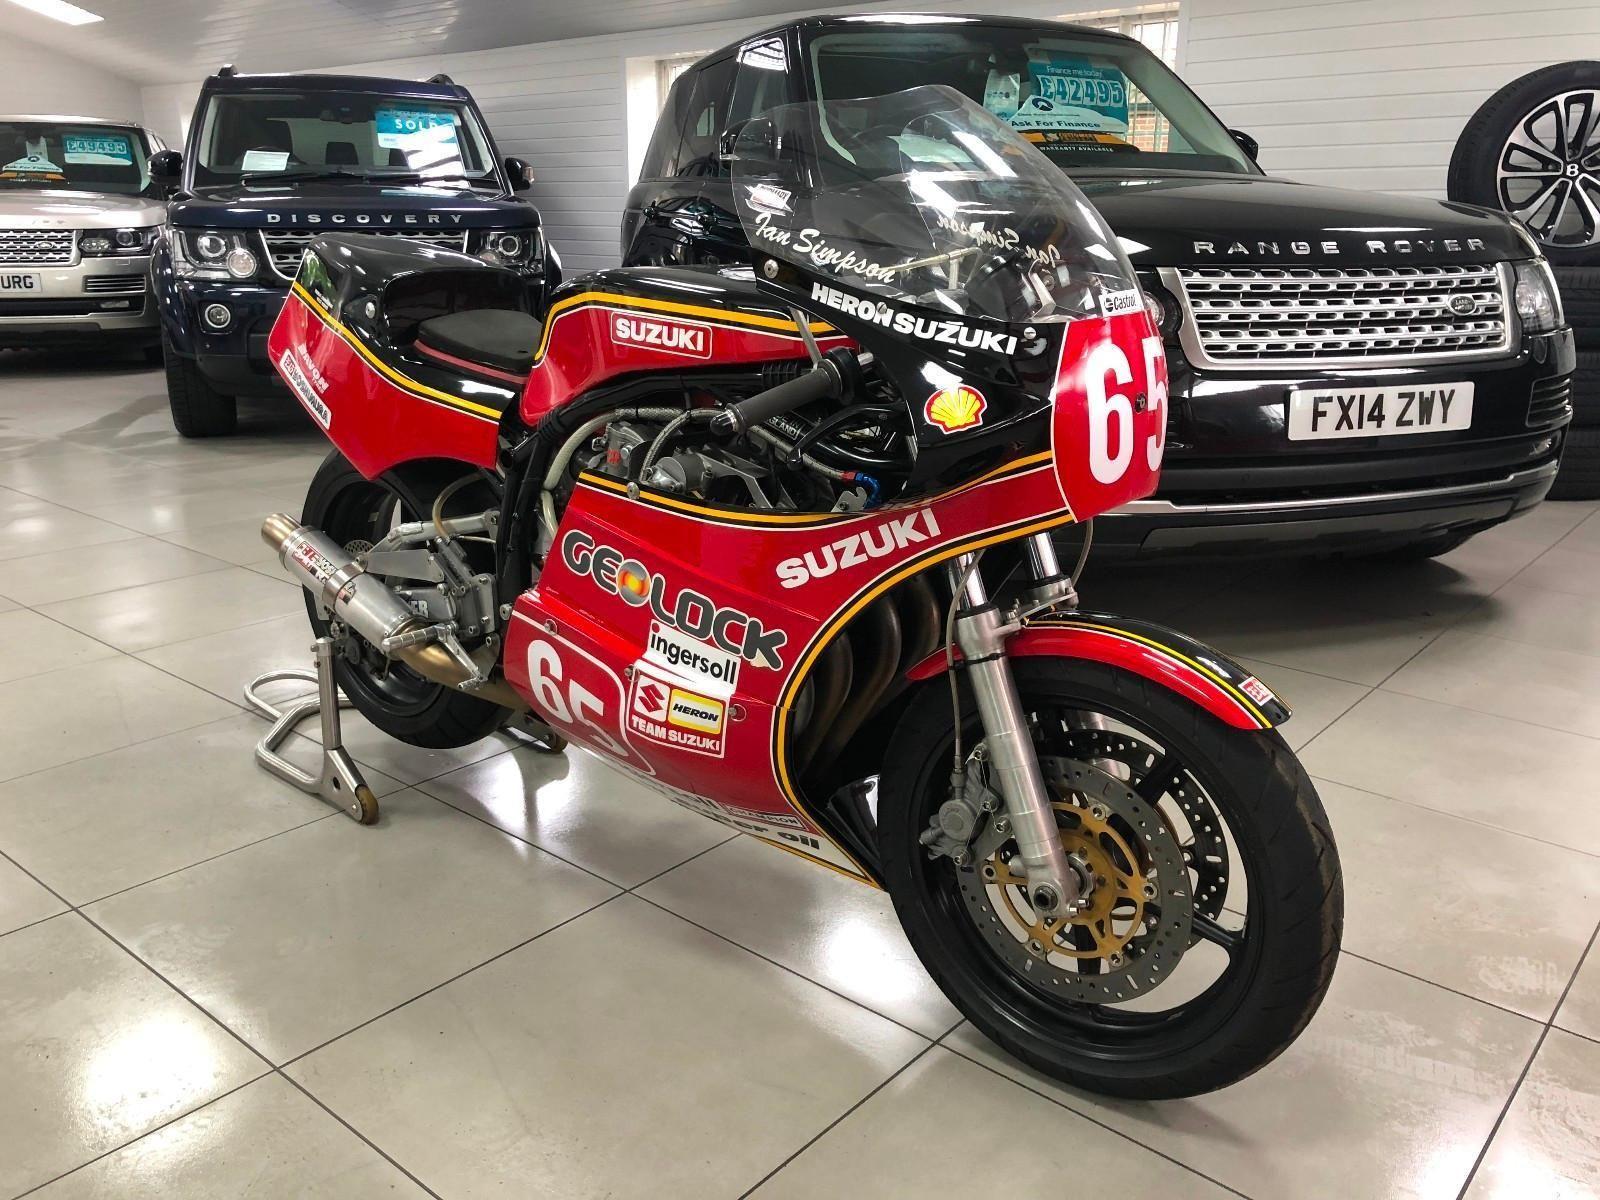 Suzuki Xr69 In Texaco Heron Classic Motorcycle Race Bike Ex Ian